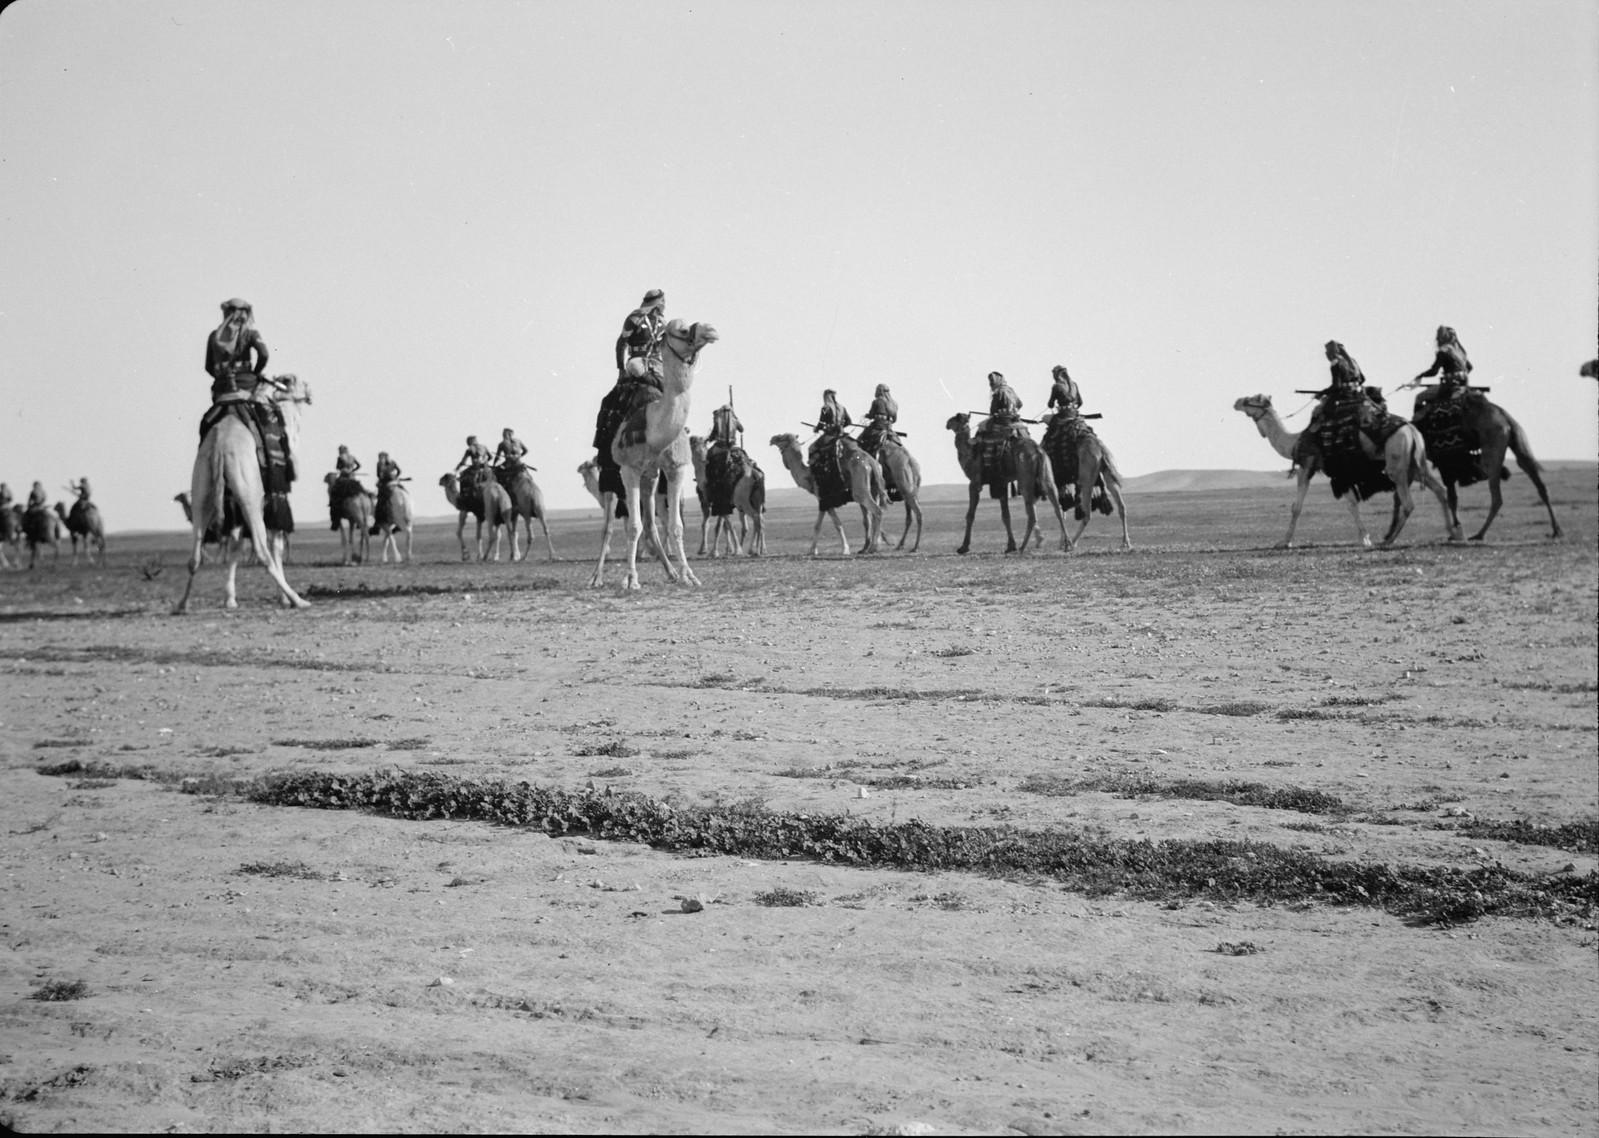 14. Верблюды маневрируют на поле.